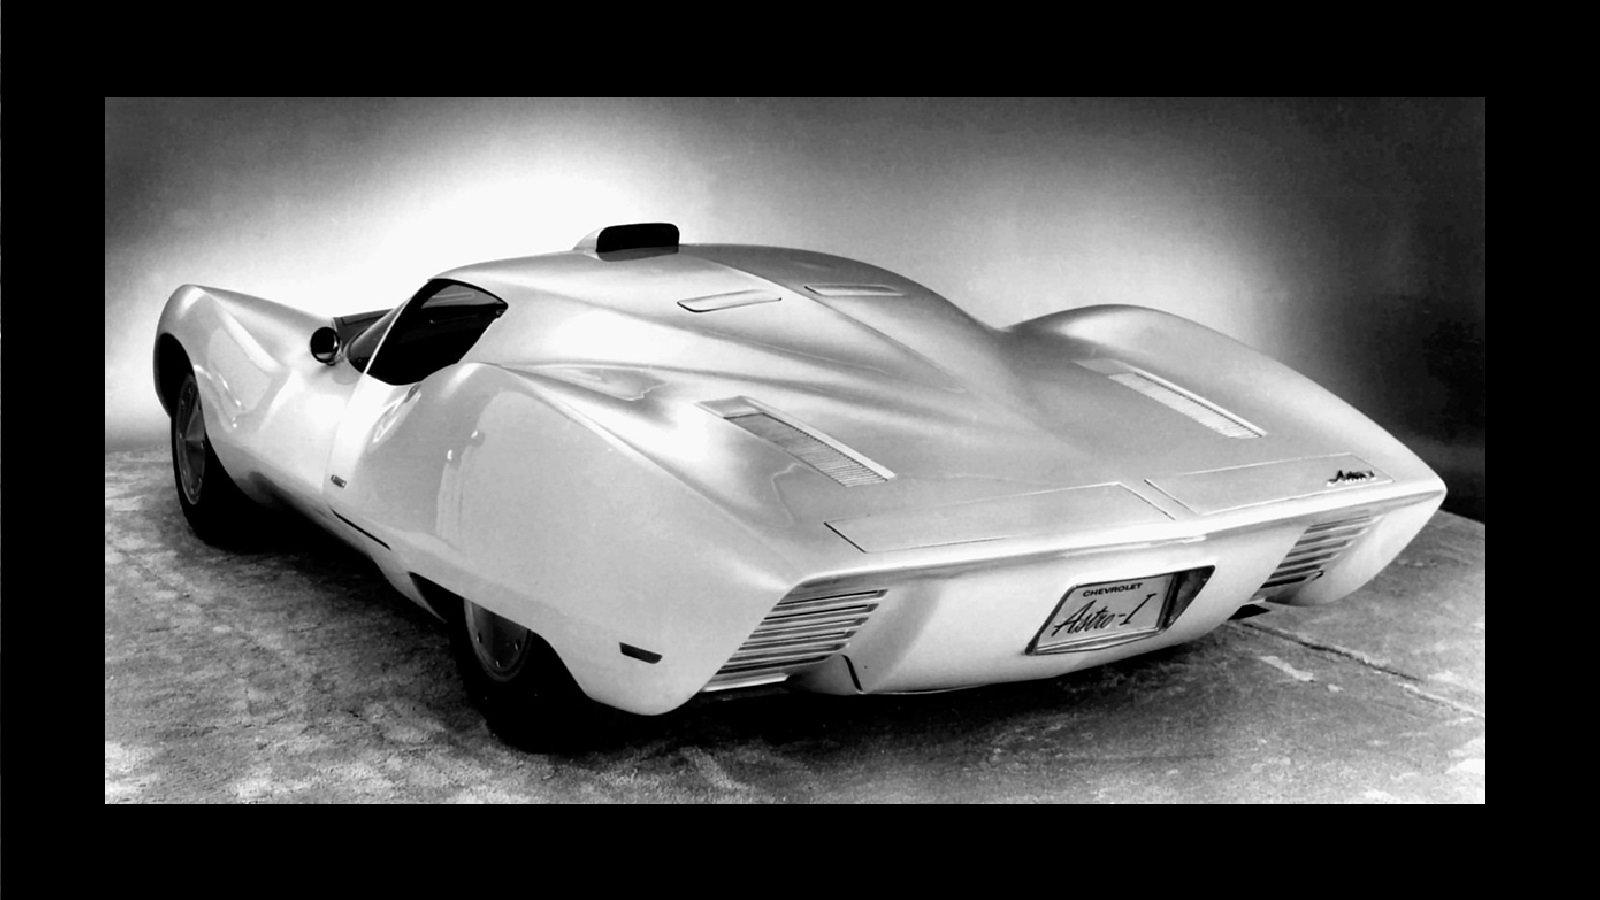 1967 Astro-I